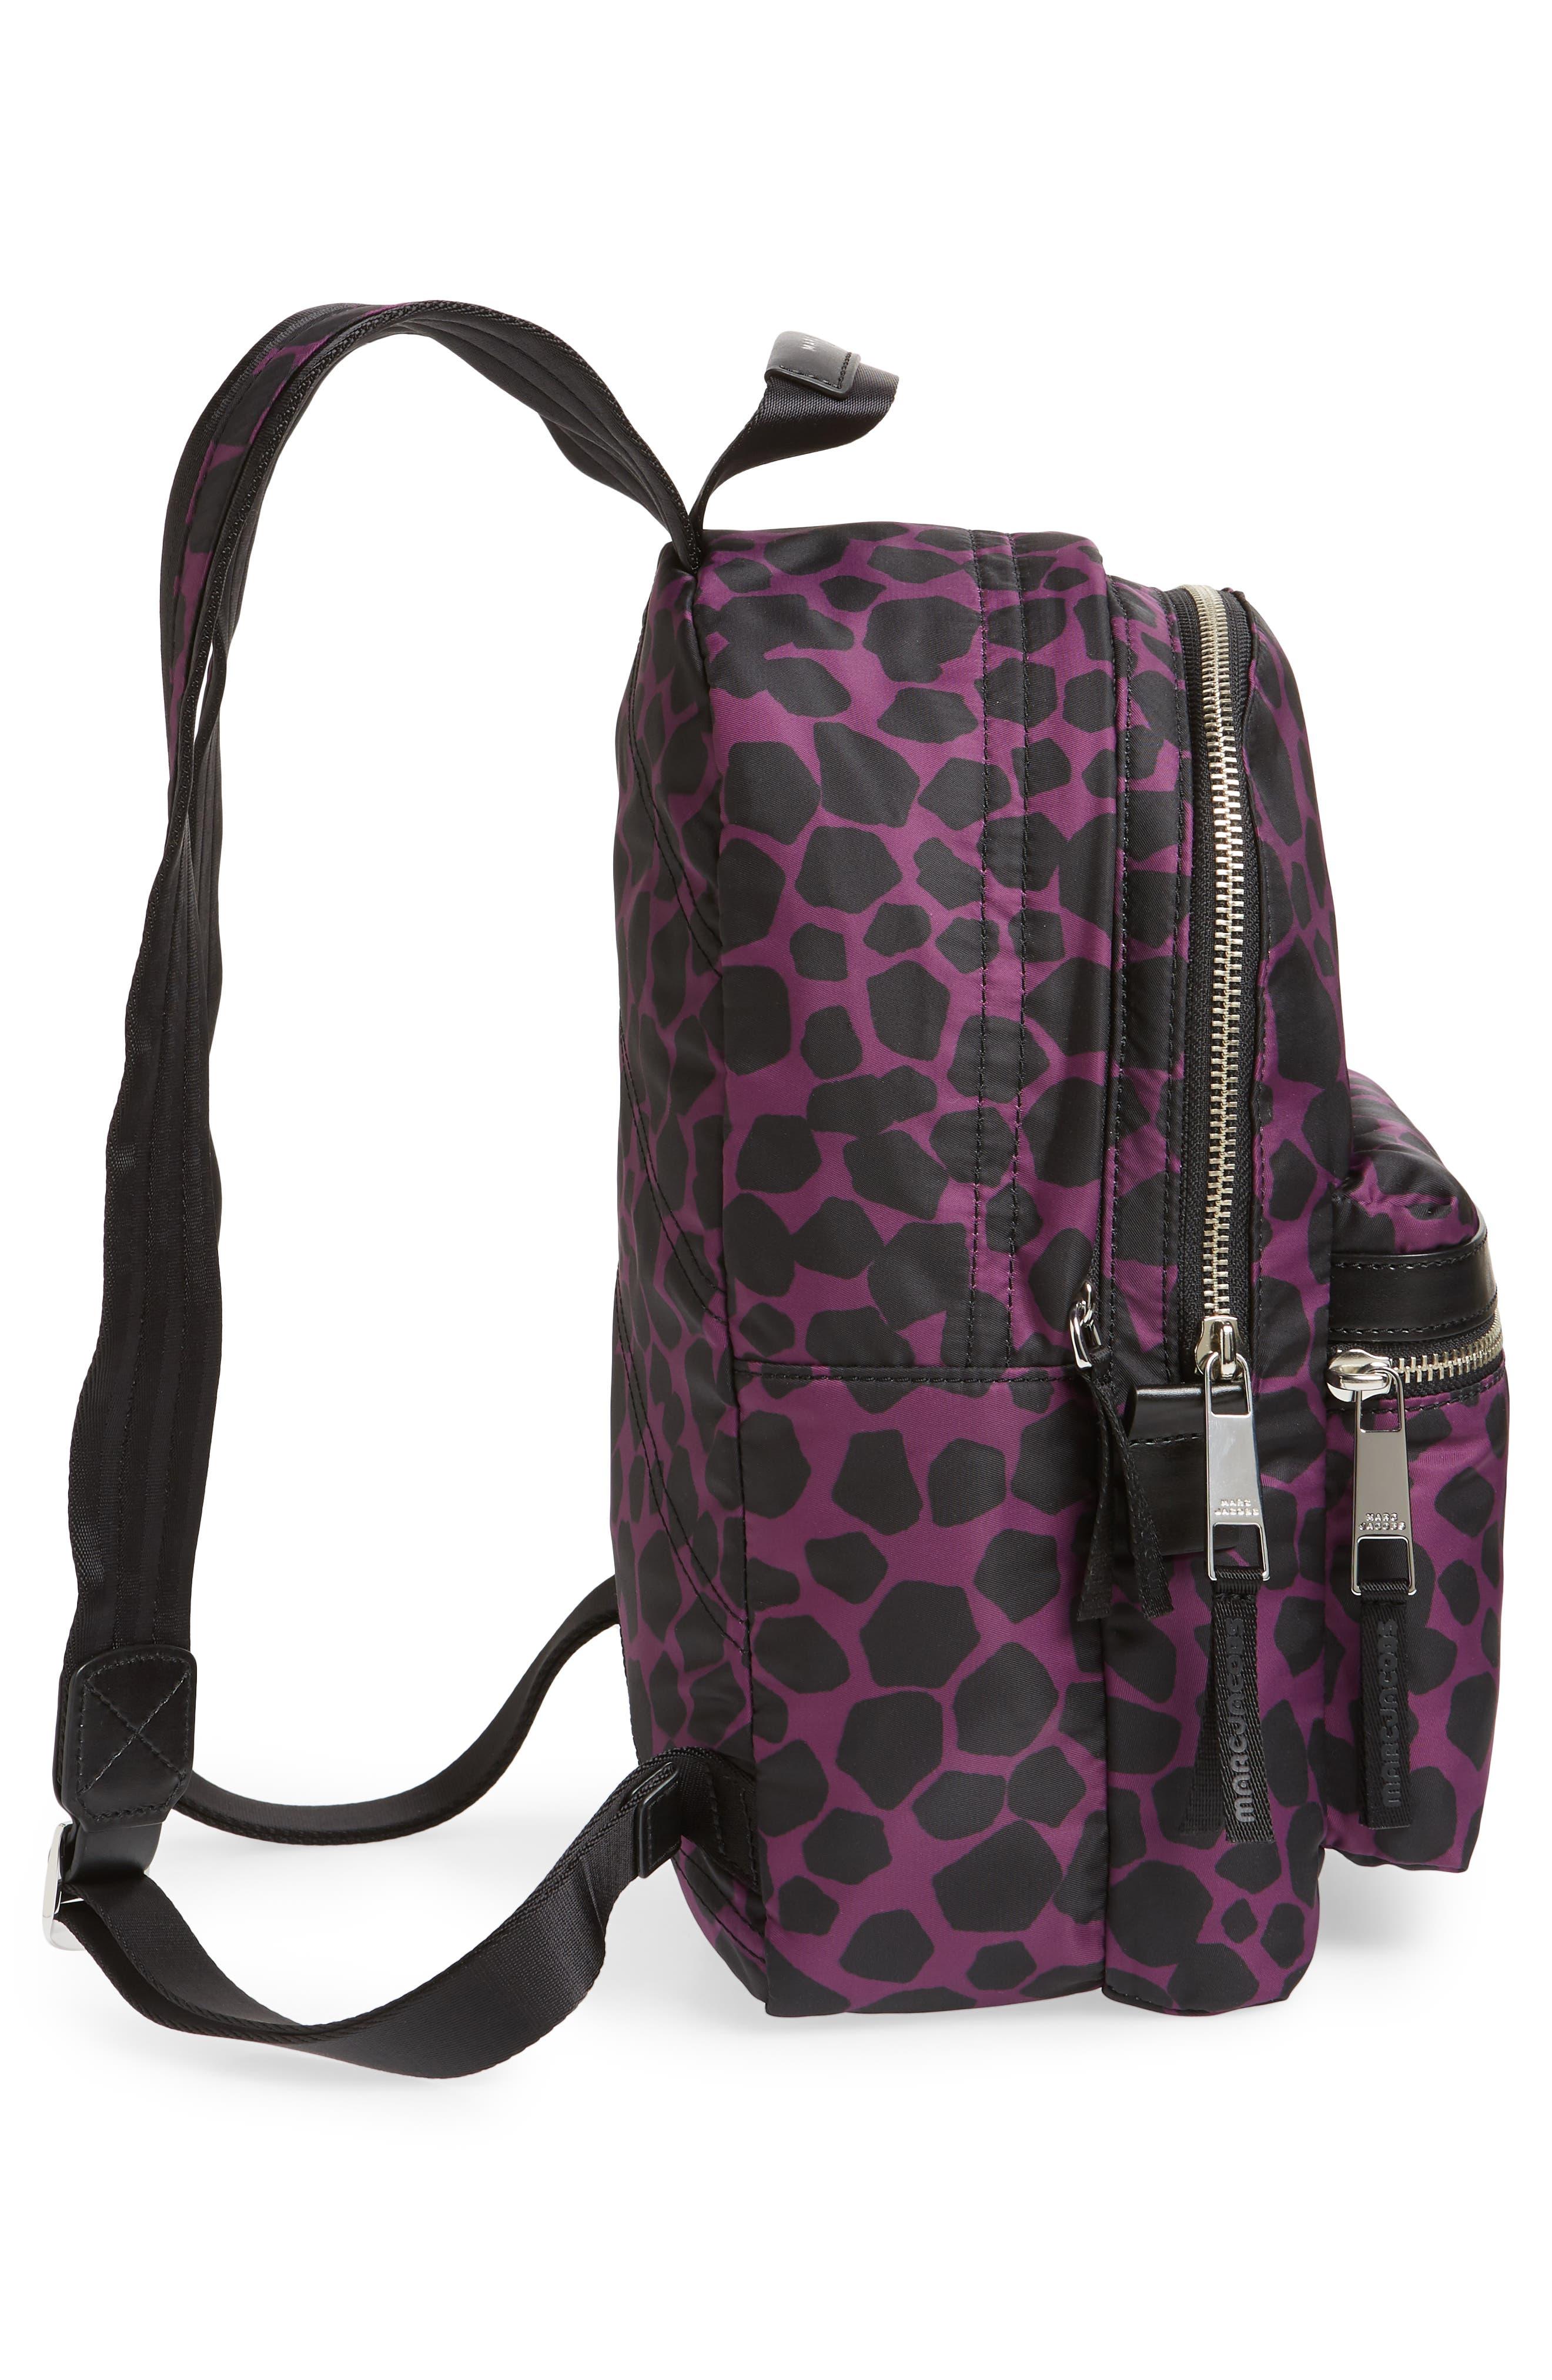 Medium Trek Pack Pebbles Backpack,                             Alternate thumbnail 5, color,                             BERRY MULTI